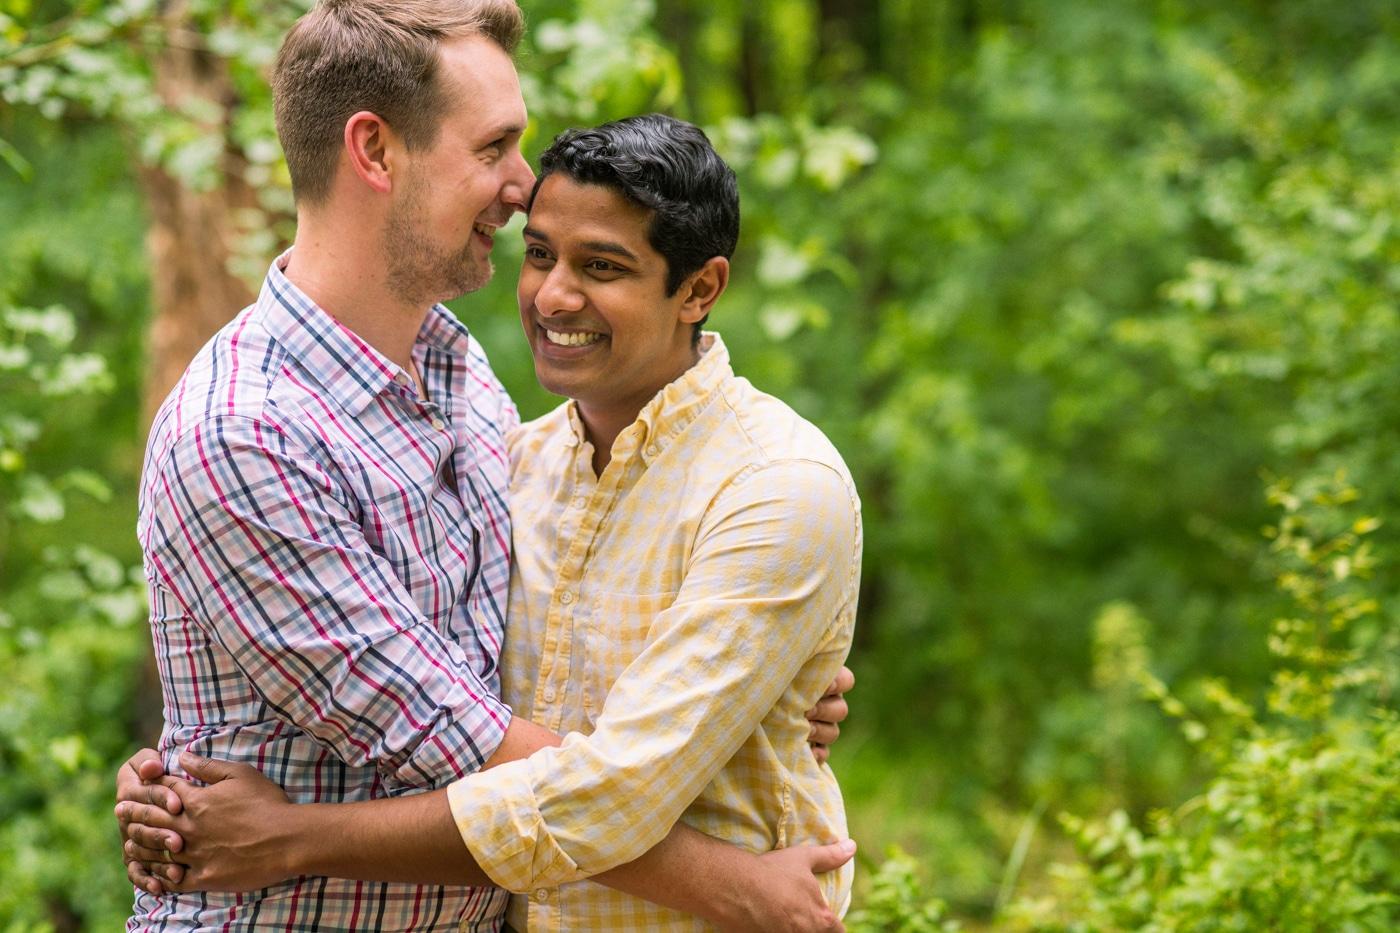 LGBTQ future spouse hugs fiance smiling outside in Atlanta GA Raven Shutley Save the Date Photoshoot